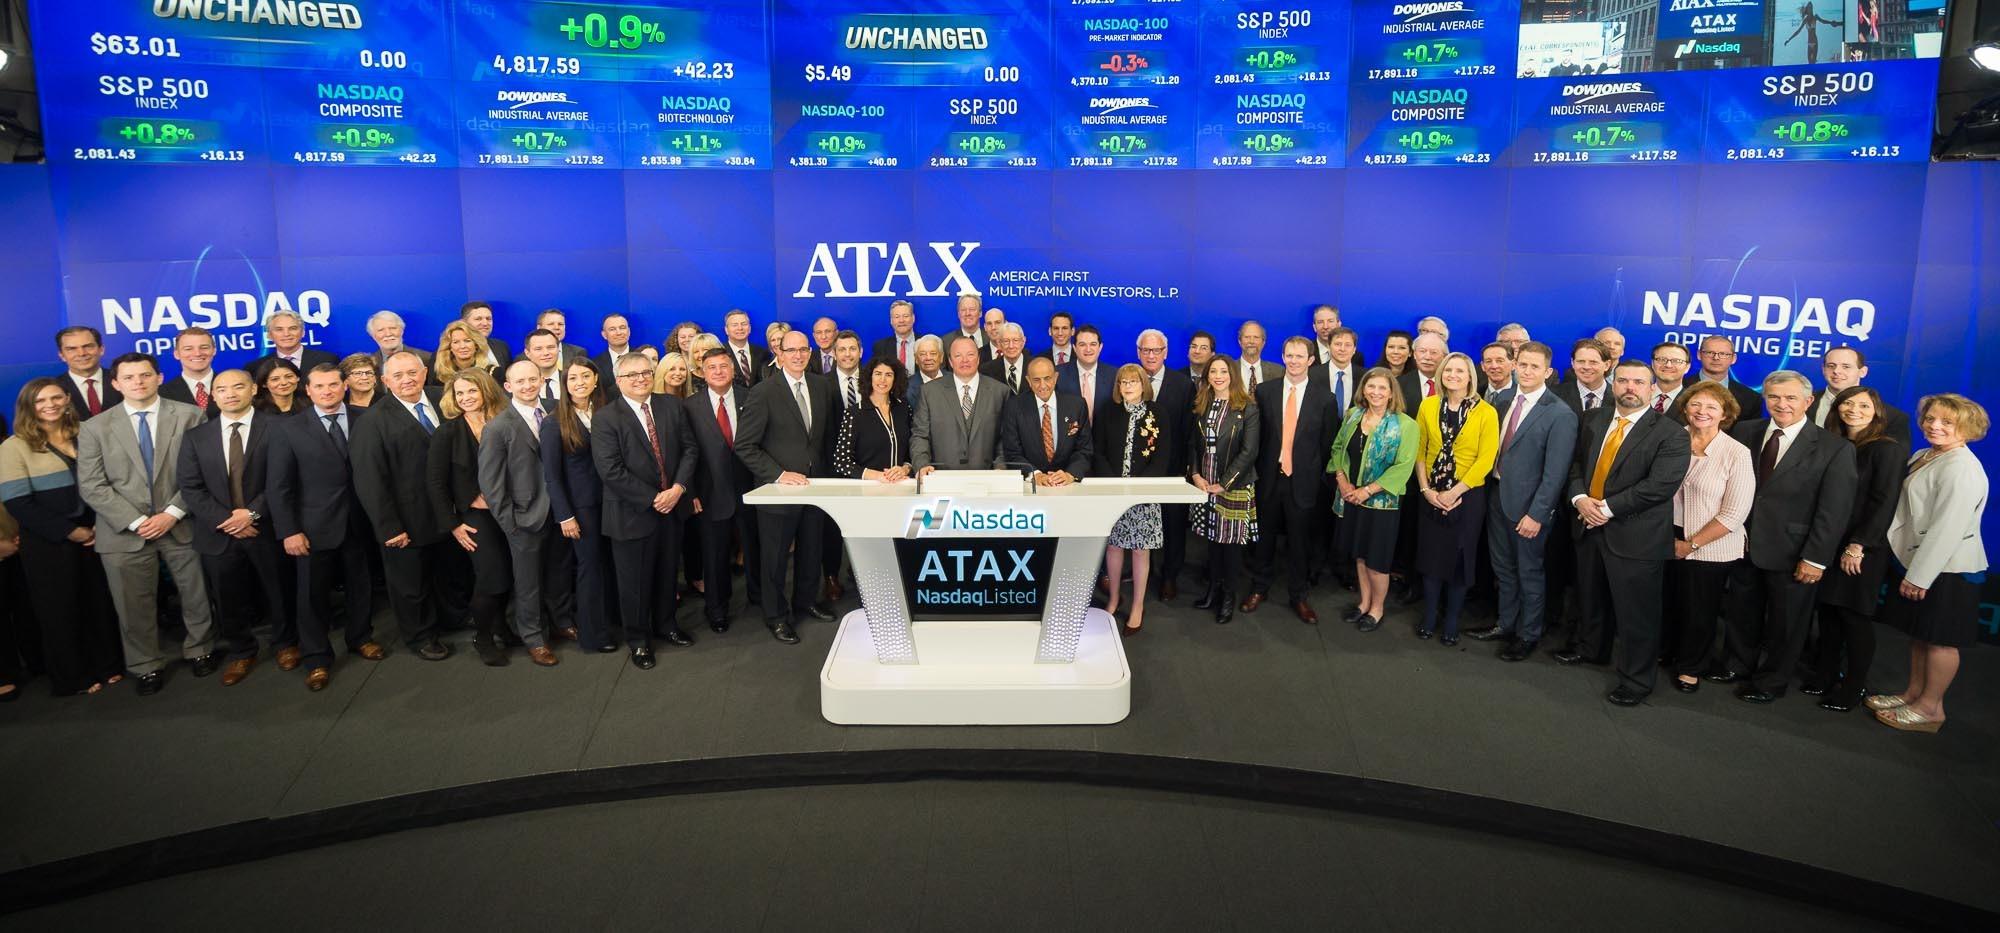 ATAX Celebrates 30 years on NASDAQ